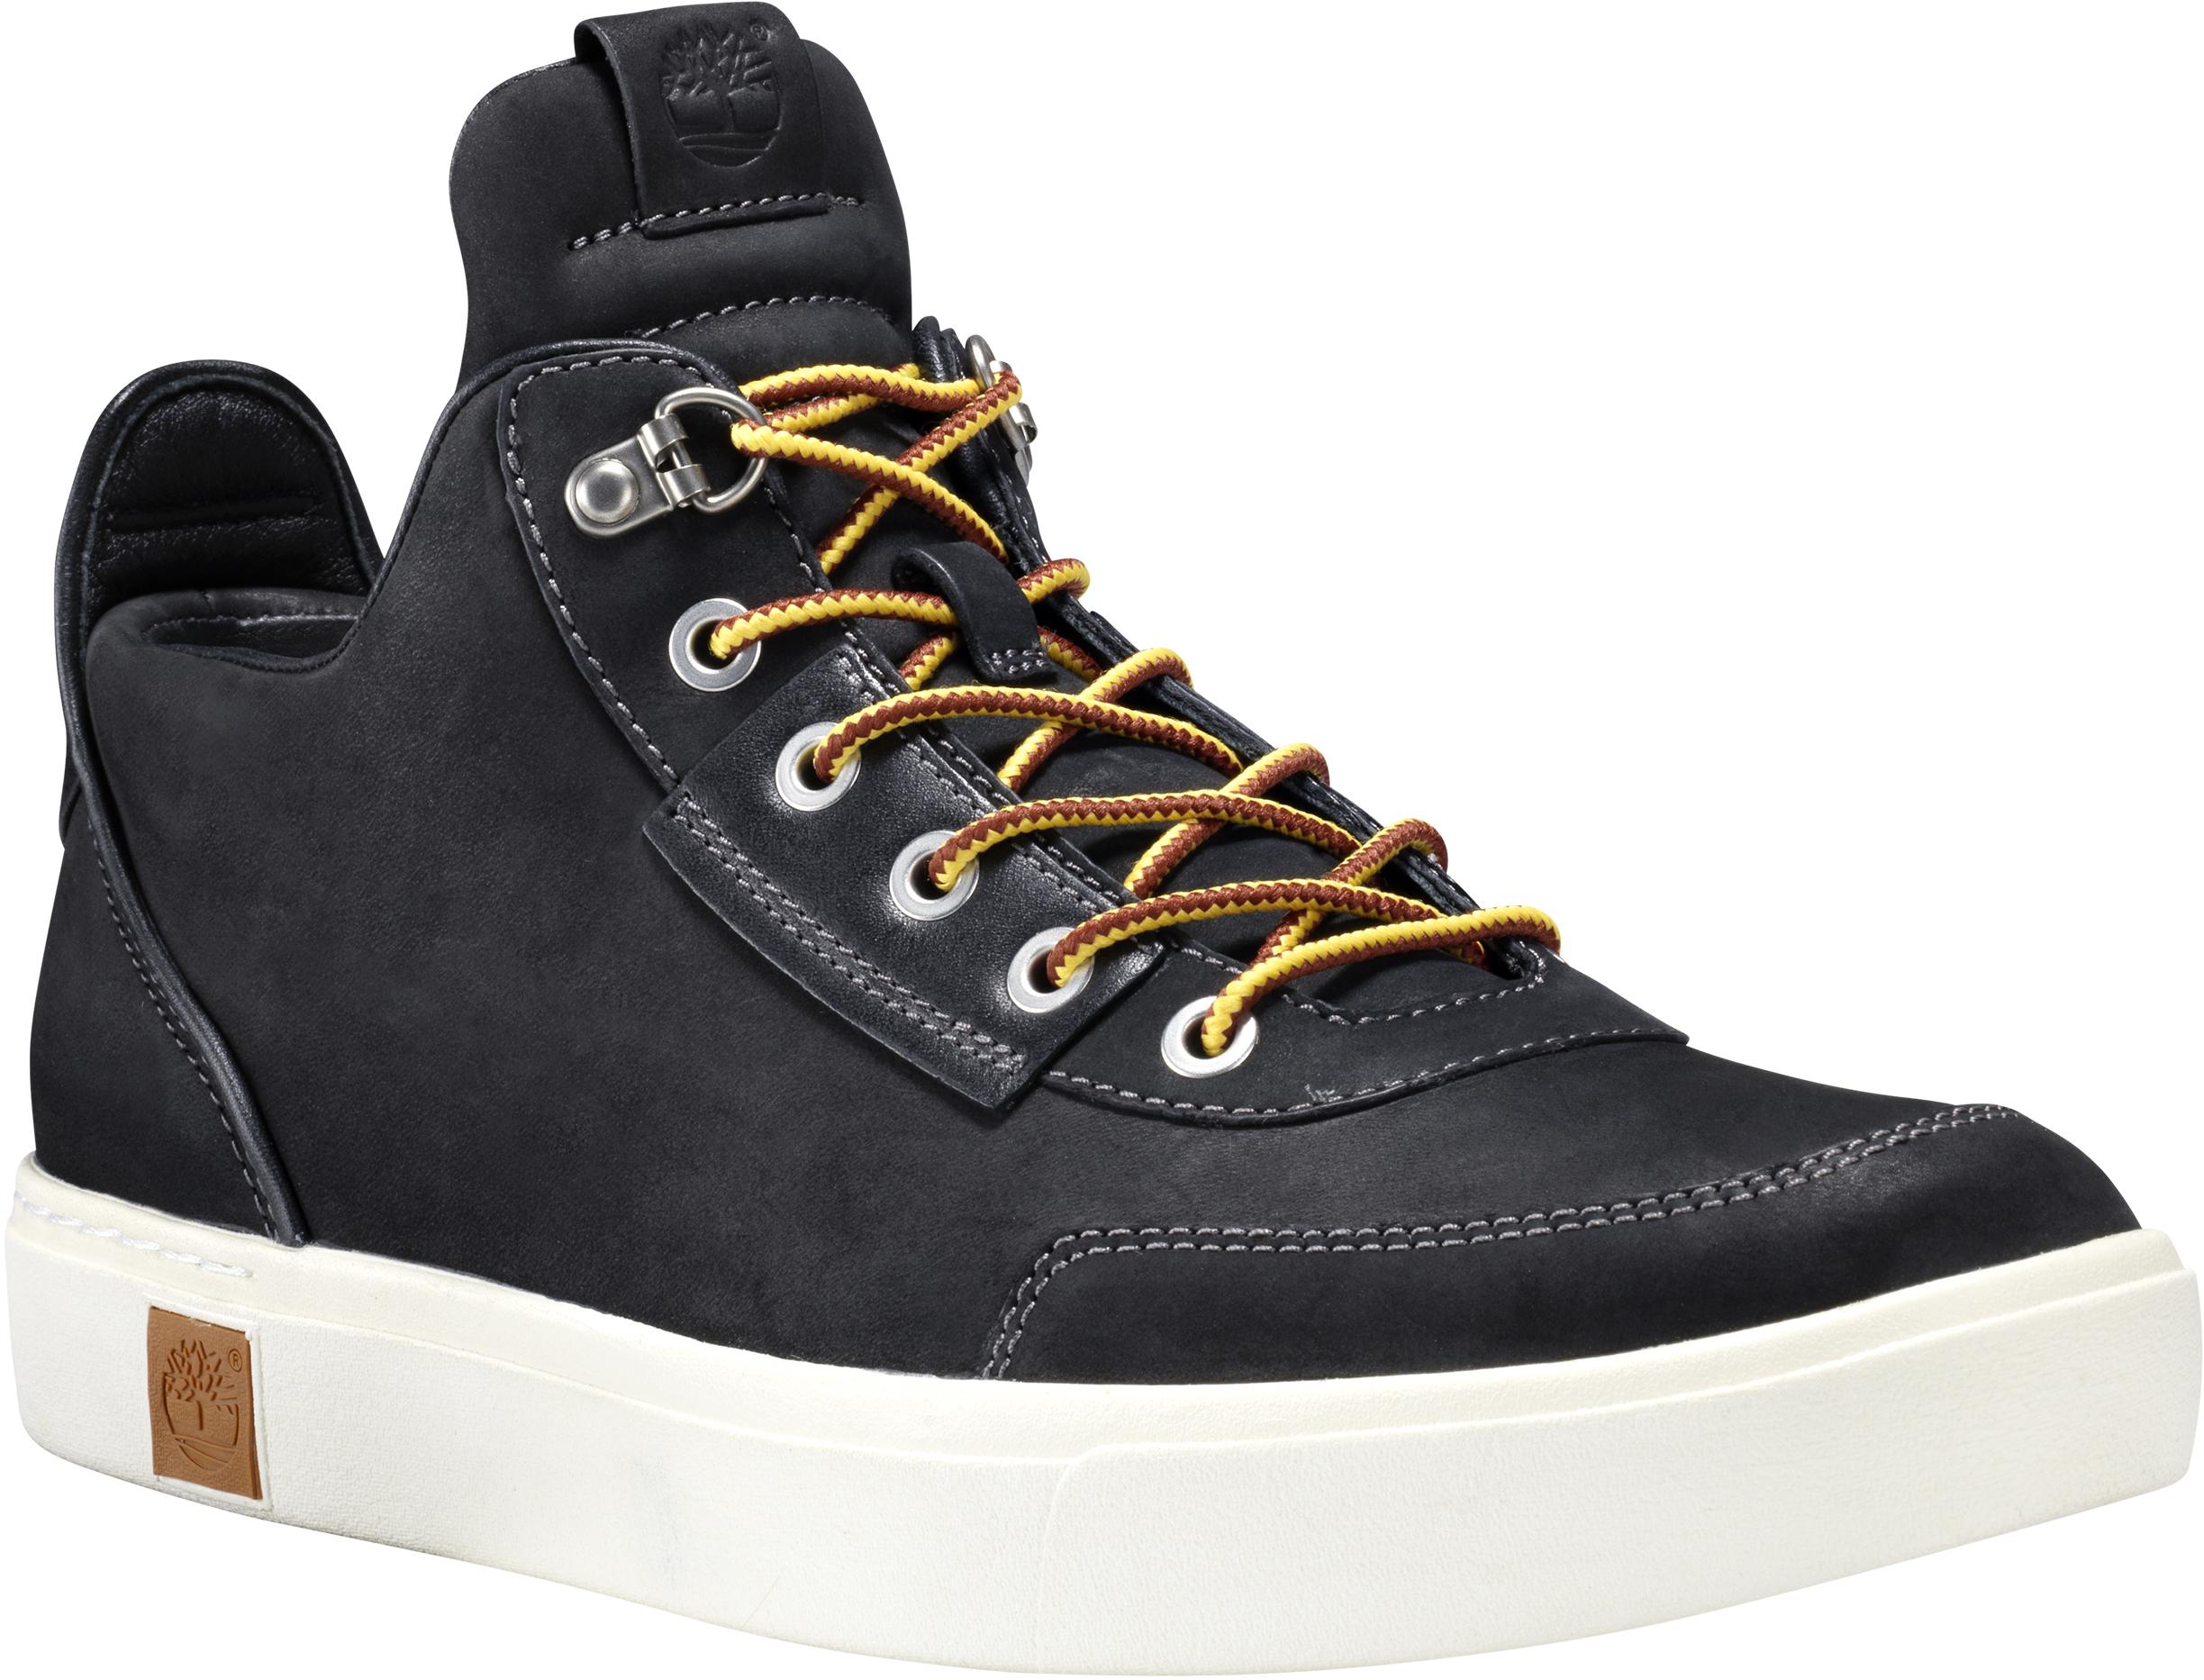 Timberland Amherst High Top Chukka Boots Sneakers Ultra Light Men's Shoes